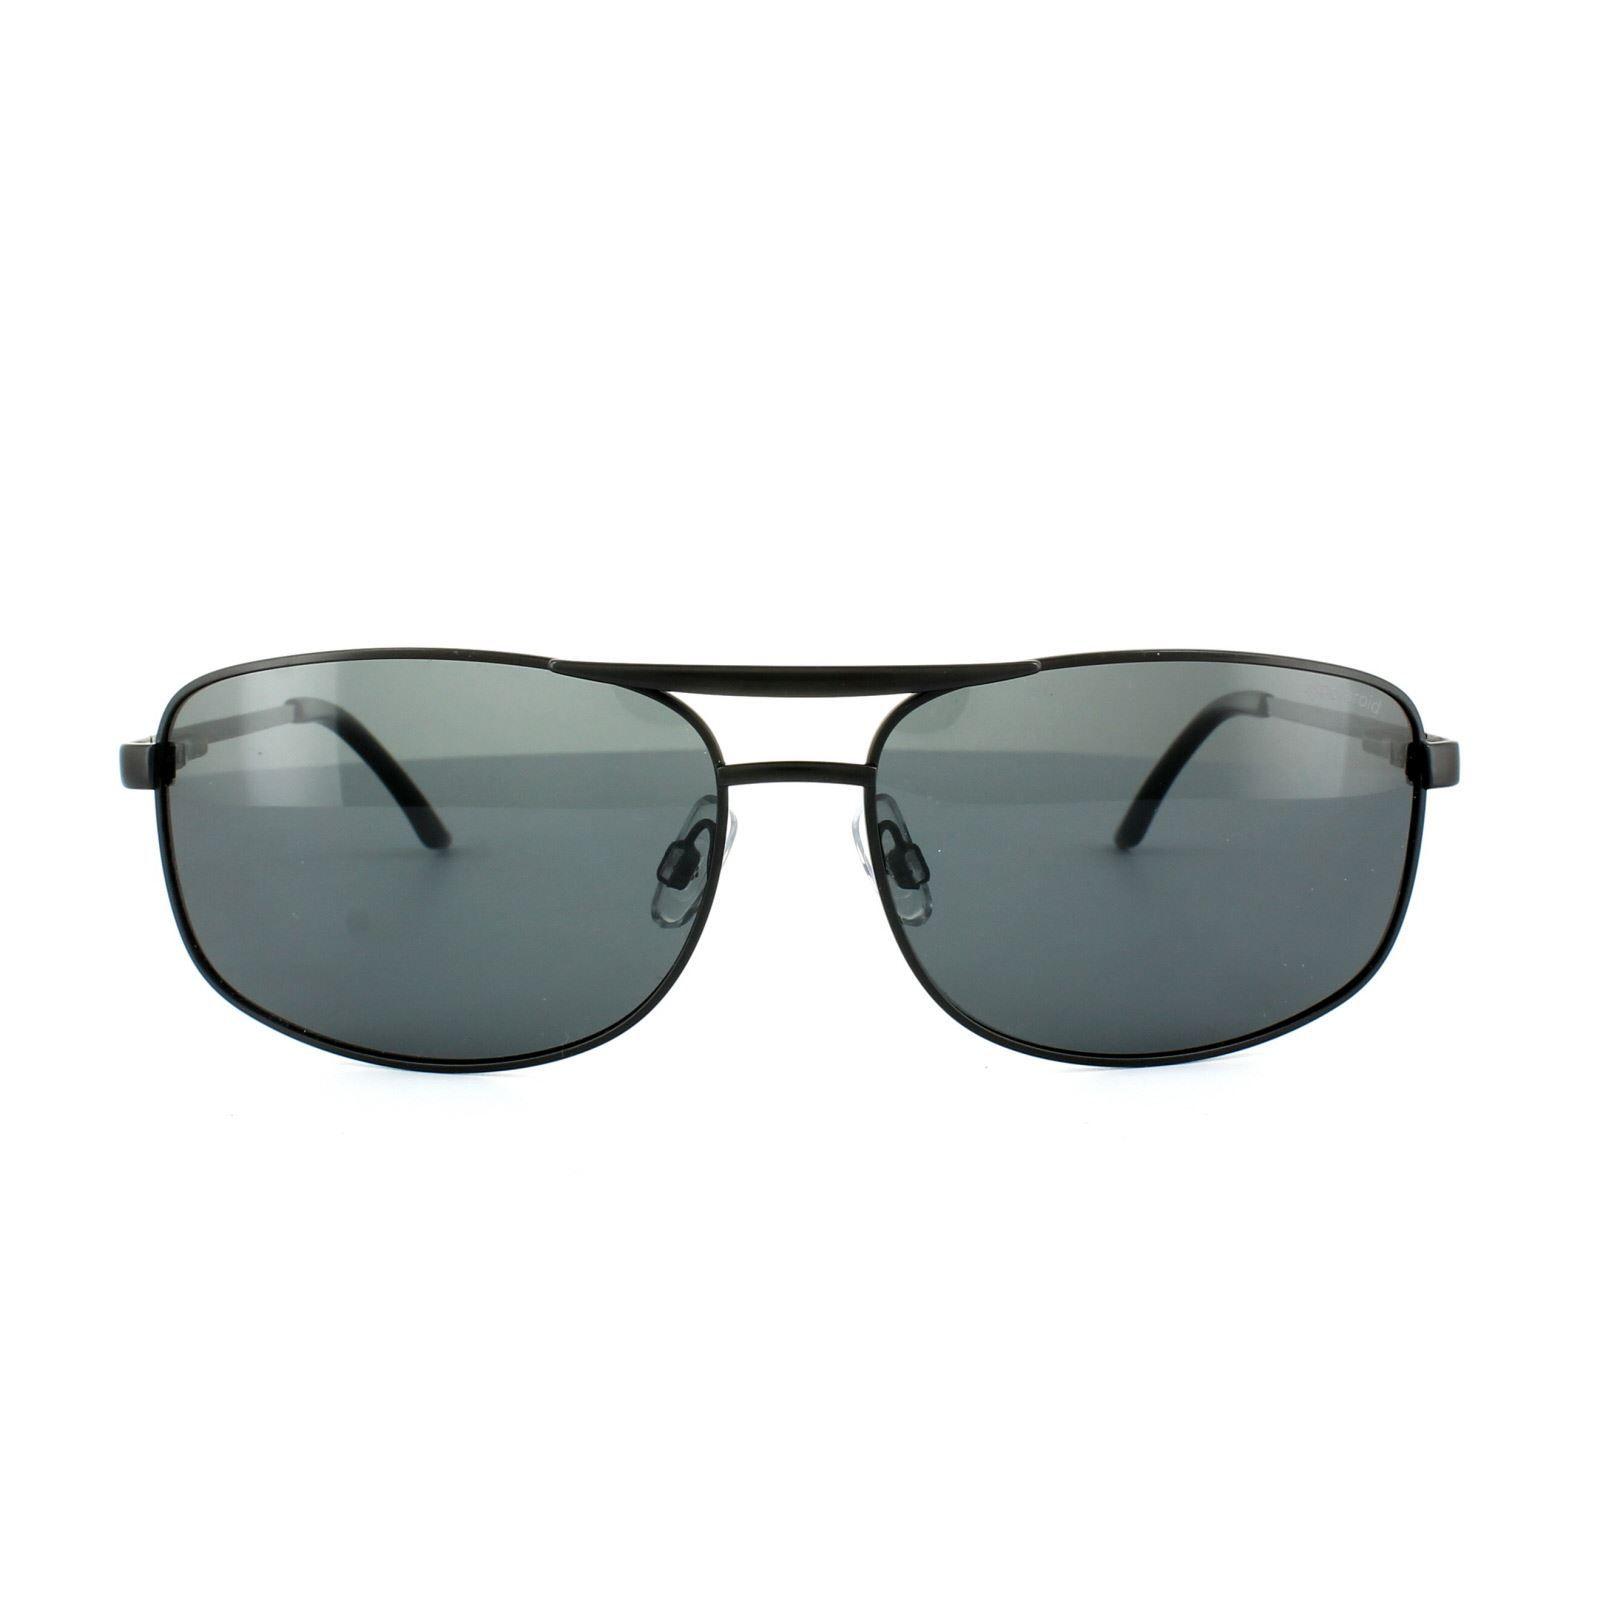 Polaroid Sunglasses 2017/S PDE Y2 Black Grey Polarized